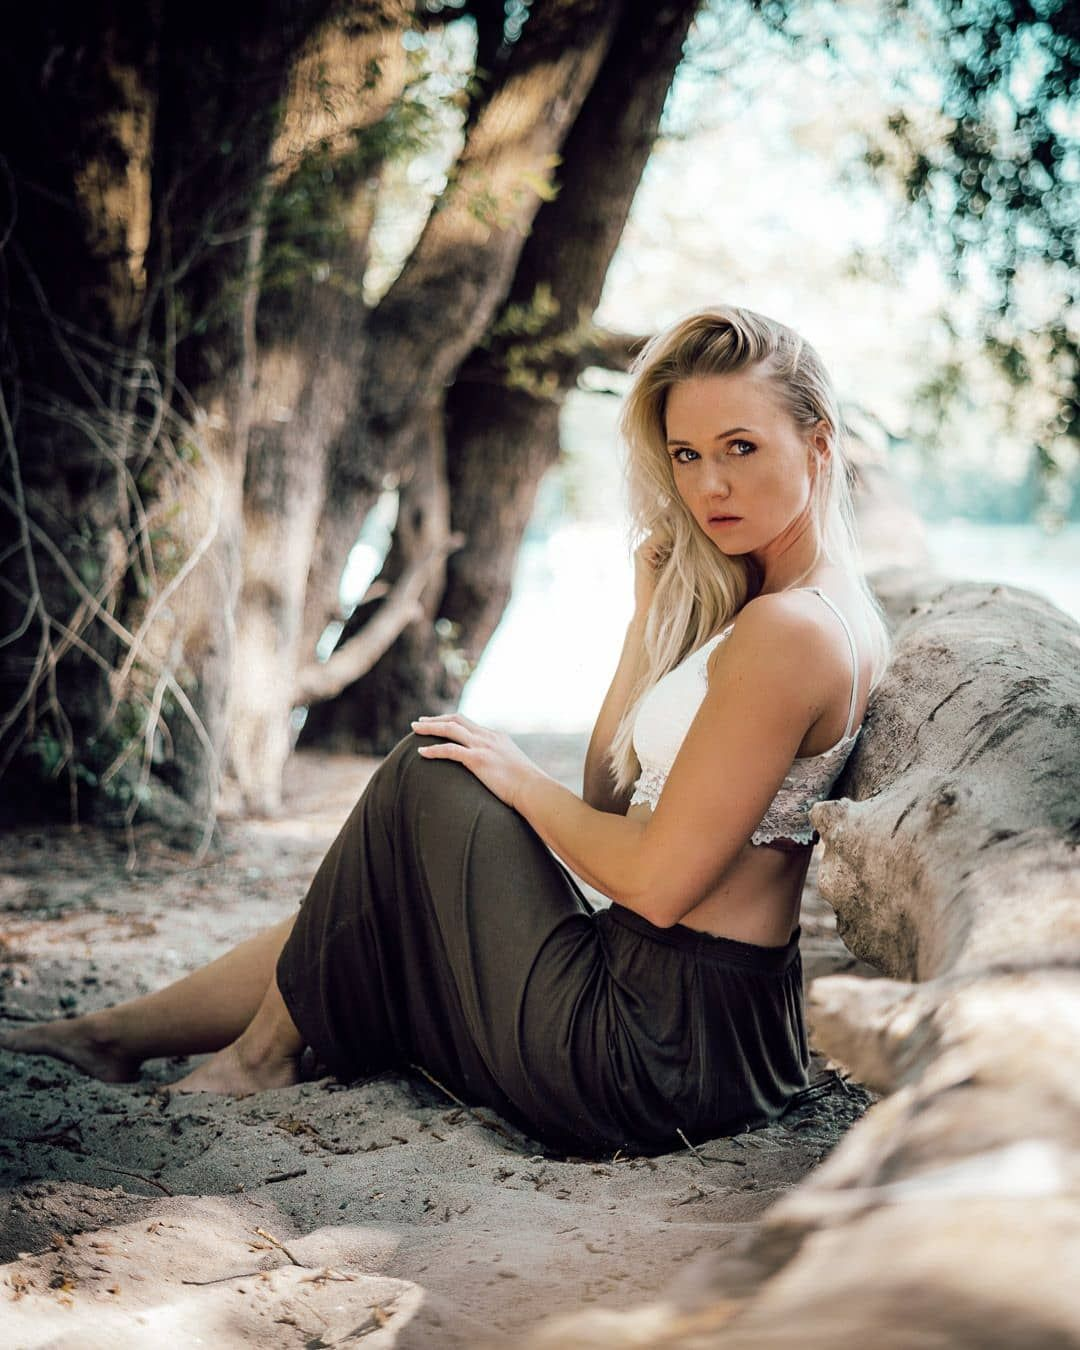 Julia . . . . . #shooting #photoshooting #fotografie #portraitphoto #photographylovers #justaportrait #globe_portraits #portraittalents #portraitsvisuals #portraitphoto #portrait_ig #fotografkarlsruhe #Karlsruhe #naturelovers #nature #outdoor #beach#sunshine #summerfeeling #summerstyle #beauty #modeling #girls #justgoshoot #picoftheday #sonyalpha #germany #stefanbarth_fotografie